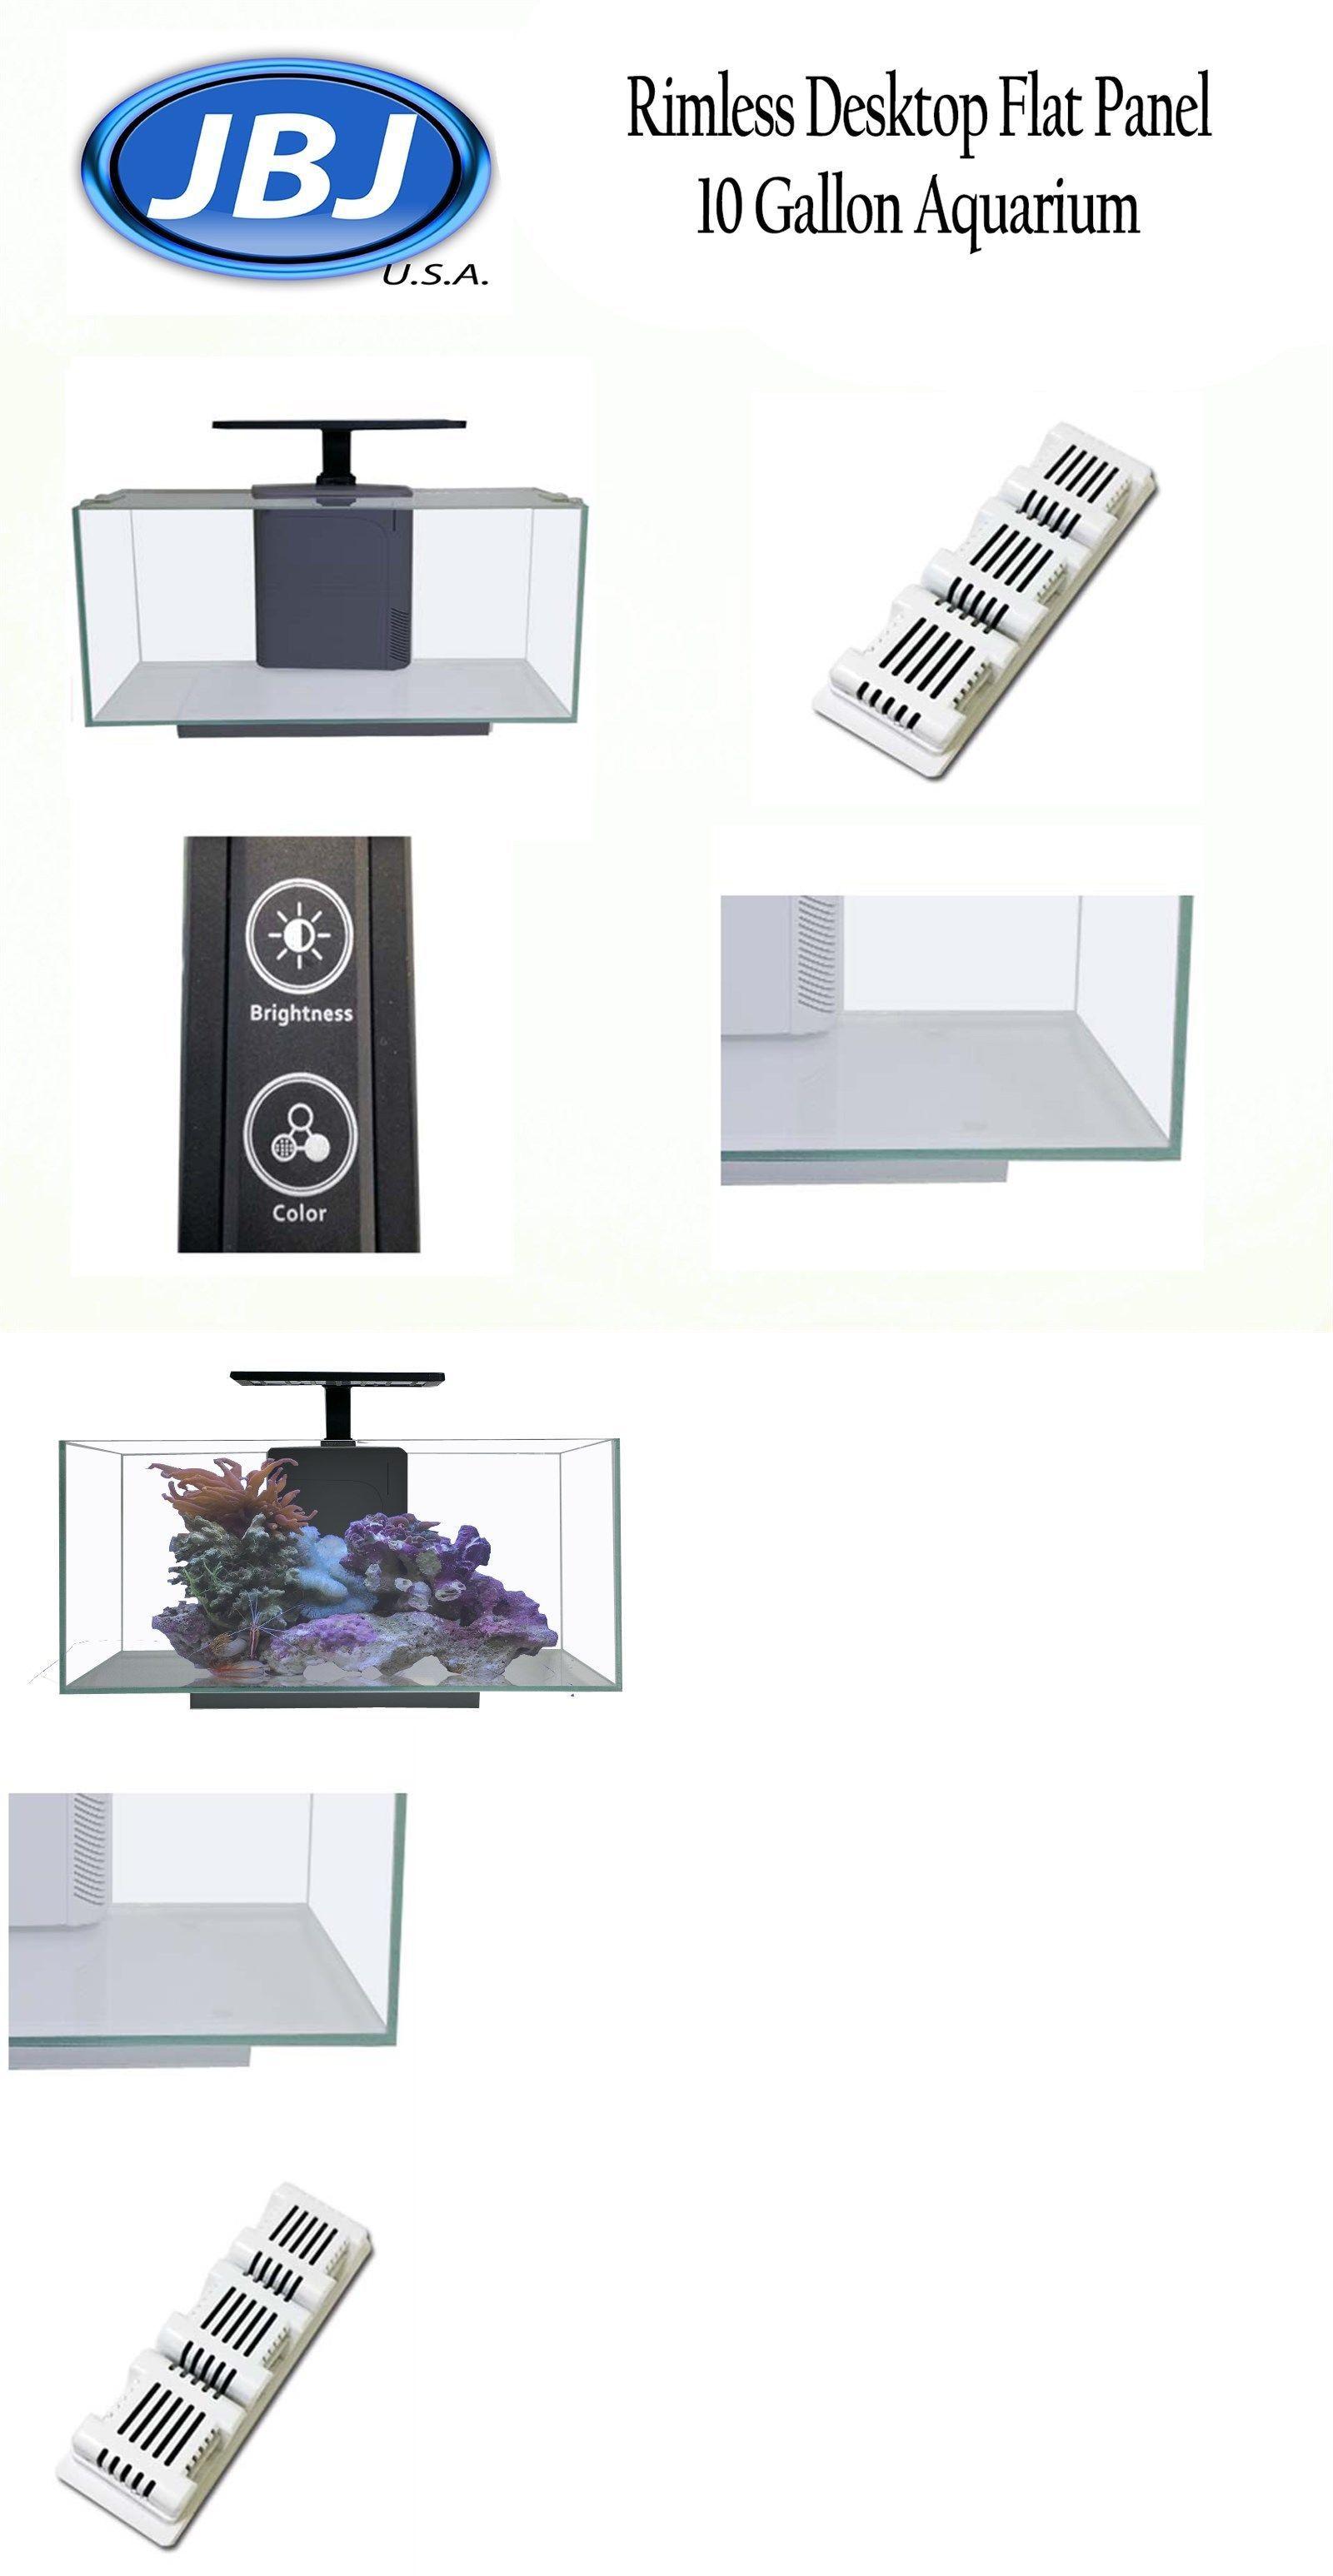 Aquariums and Tanks Jbj Rimless Desktop Flat Panel 10